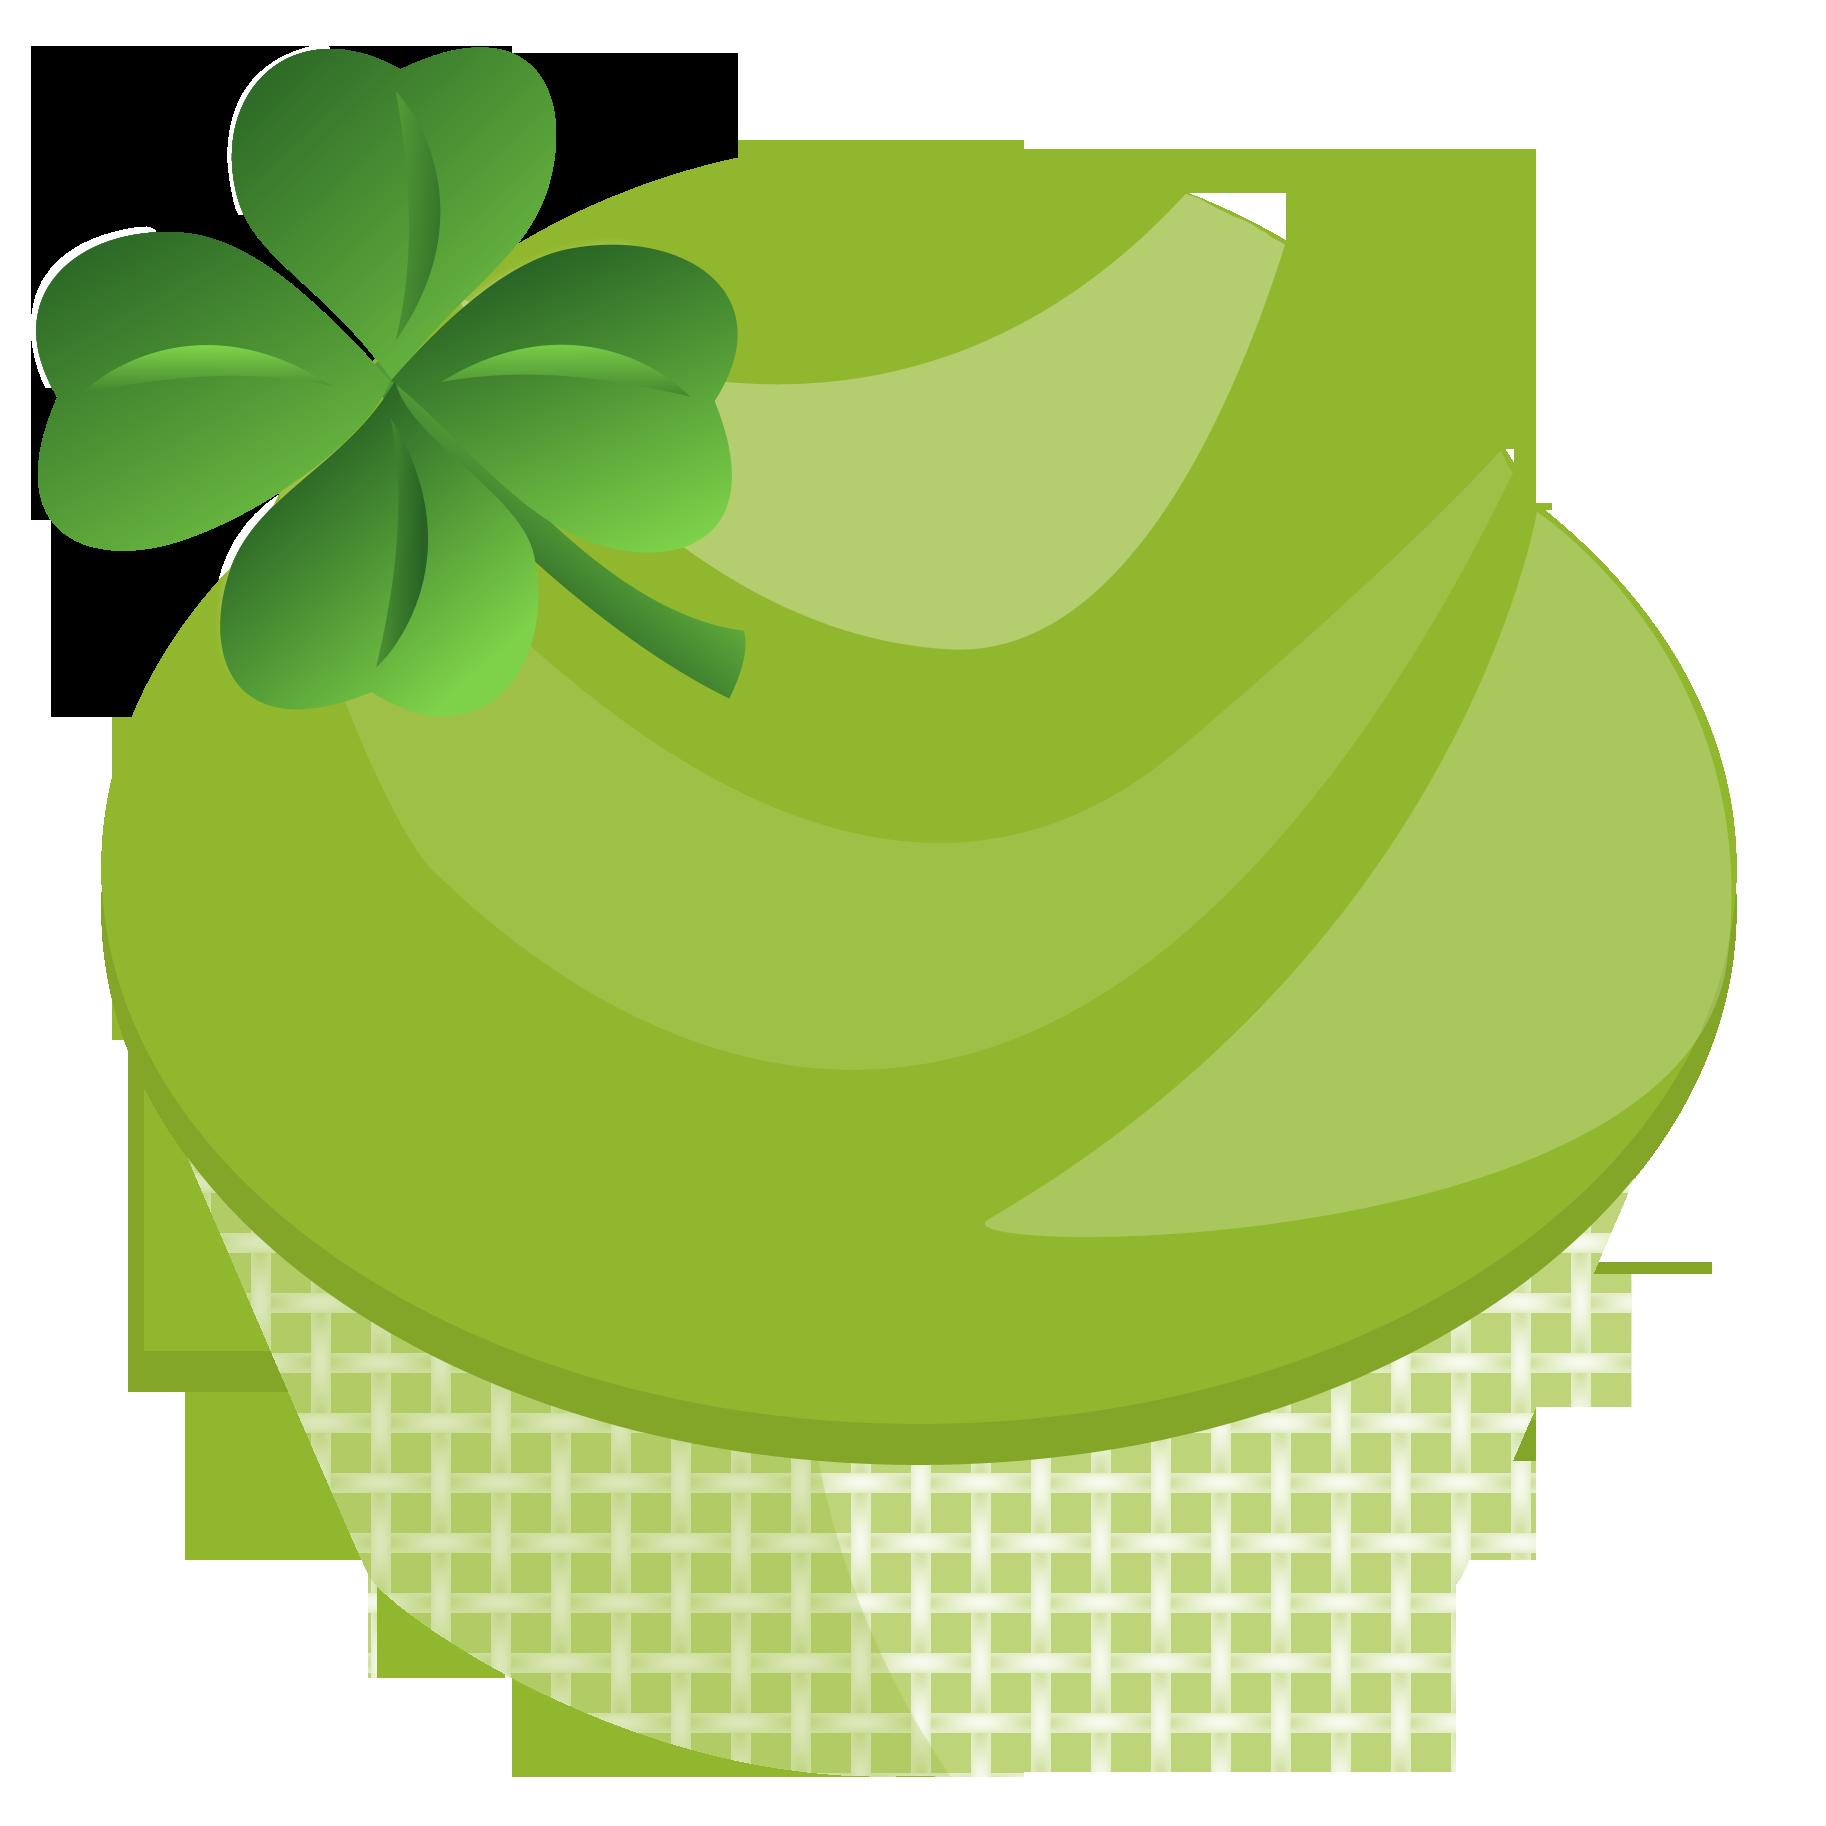 Turkey cupcake clipart black and white download St. Patricks Day Cupcake Graphic | Cupcake Clipart black and white download